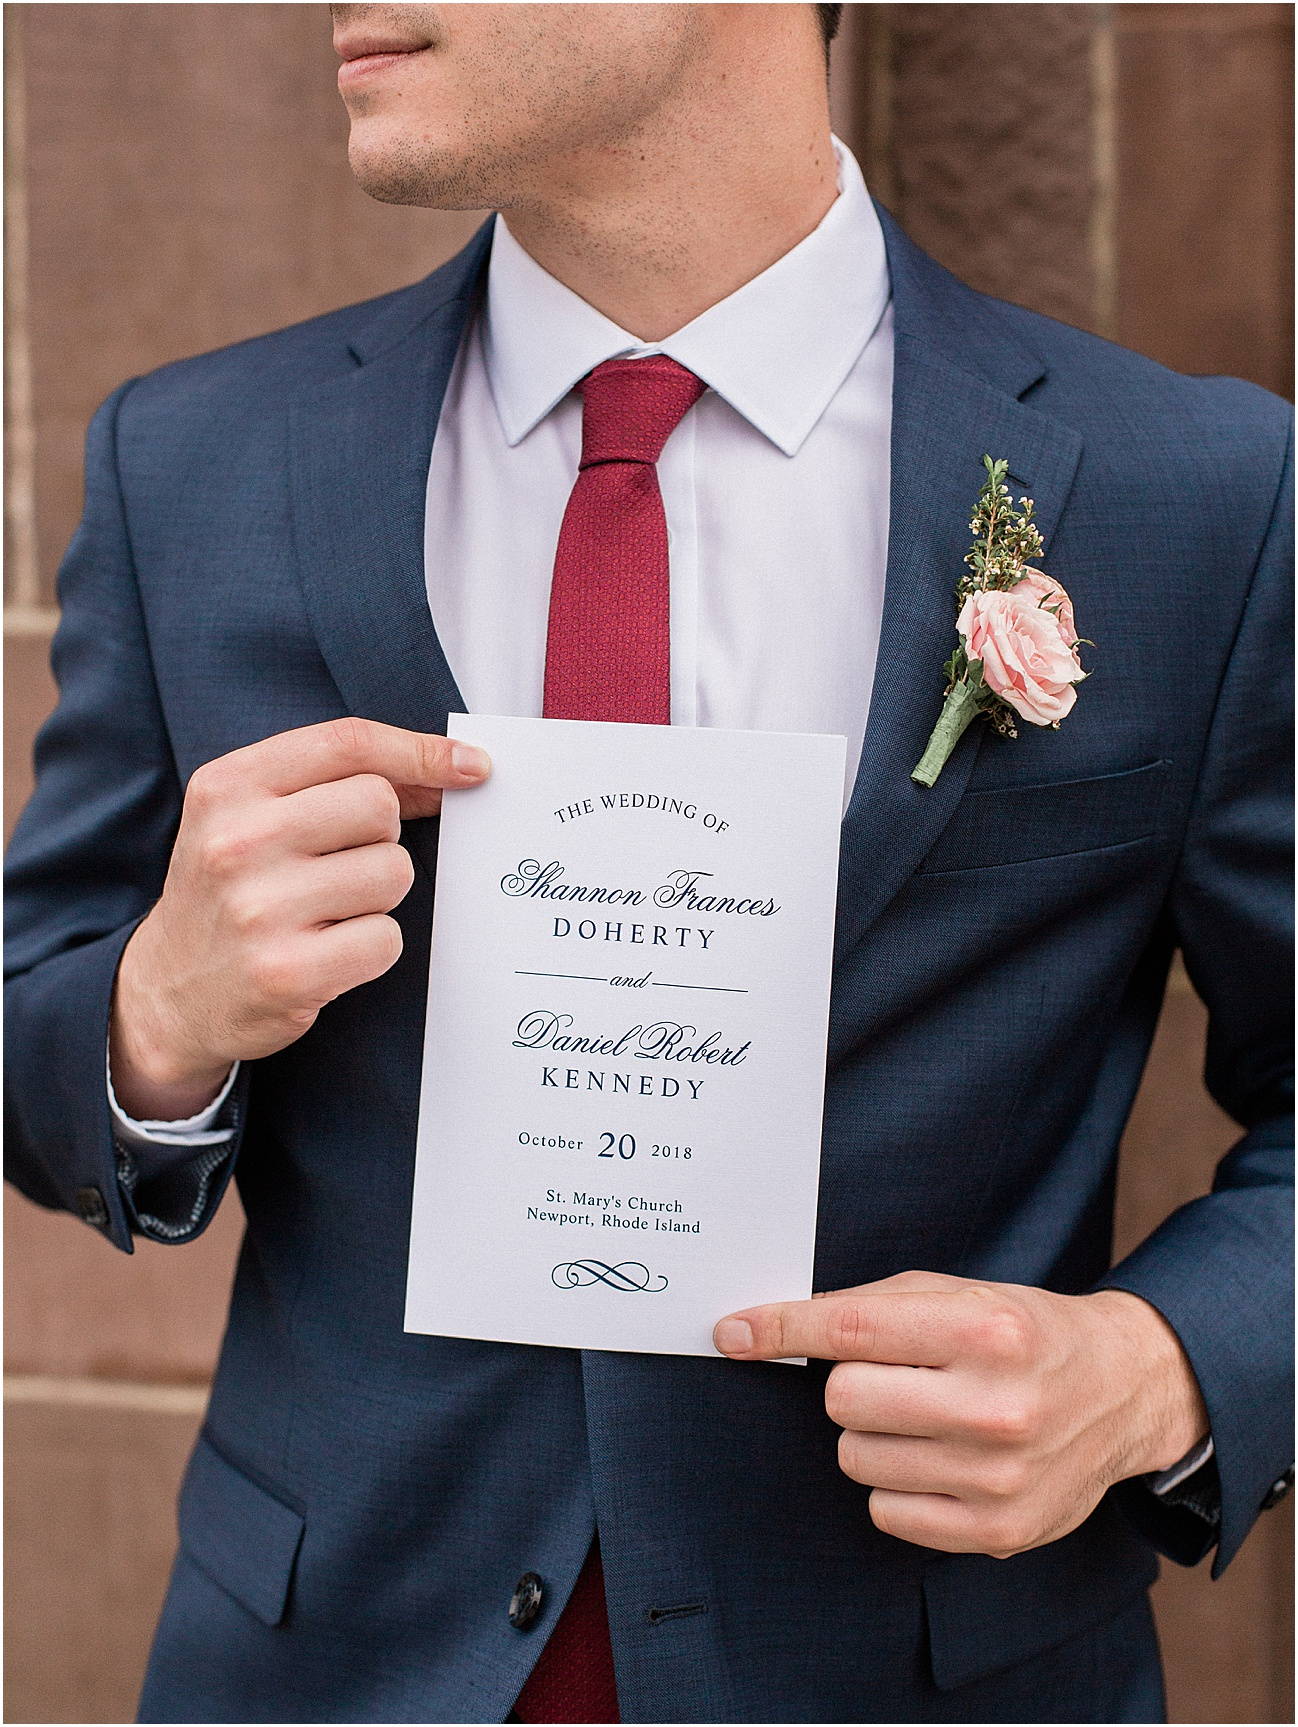 shannon_daniel_dan_atlantic_resort_saint_marys_st_mary_church_fall_newport_catholic_irish_cape_cod_boston_wedding_photographer_meredith_jane_photography_photo_1617.jpg